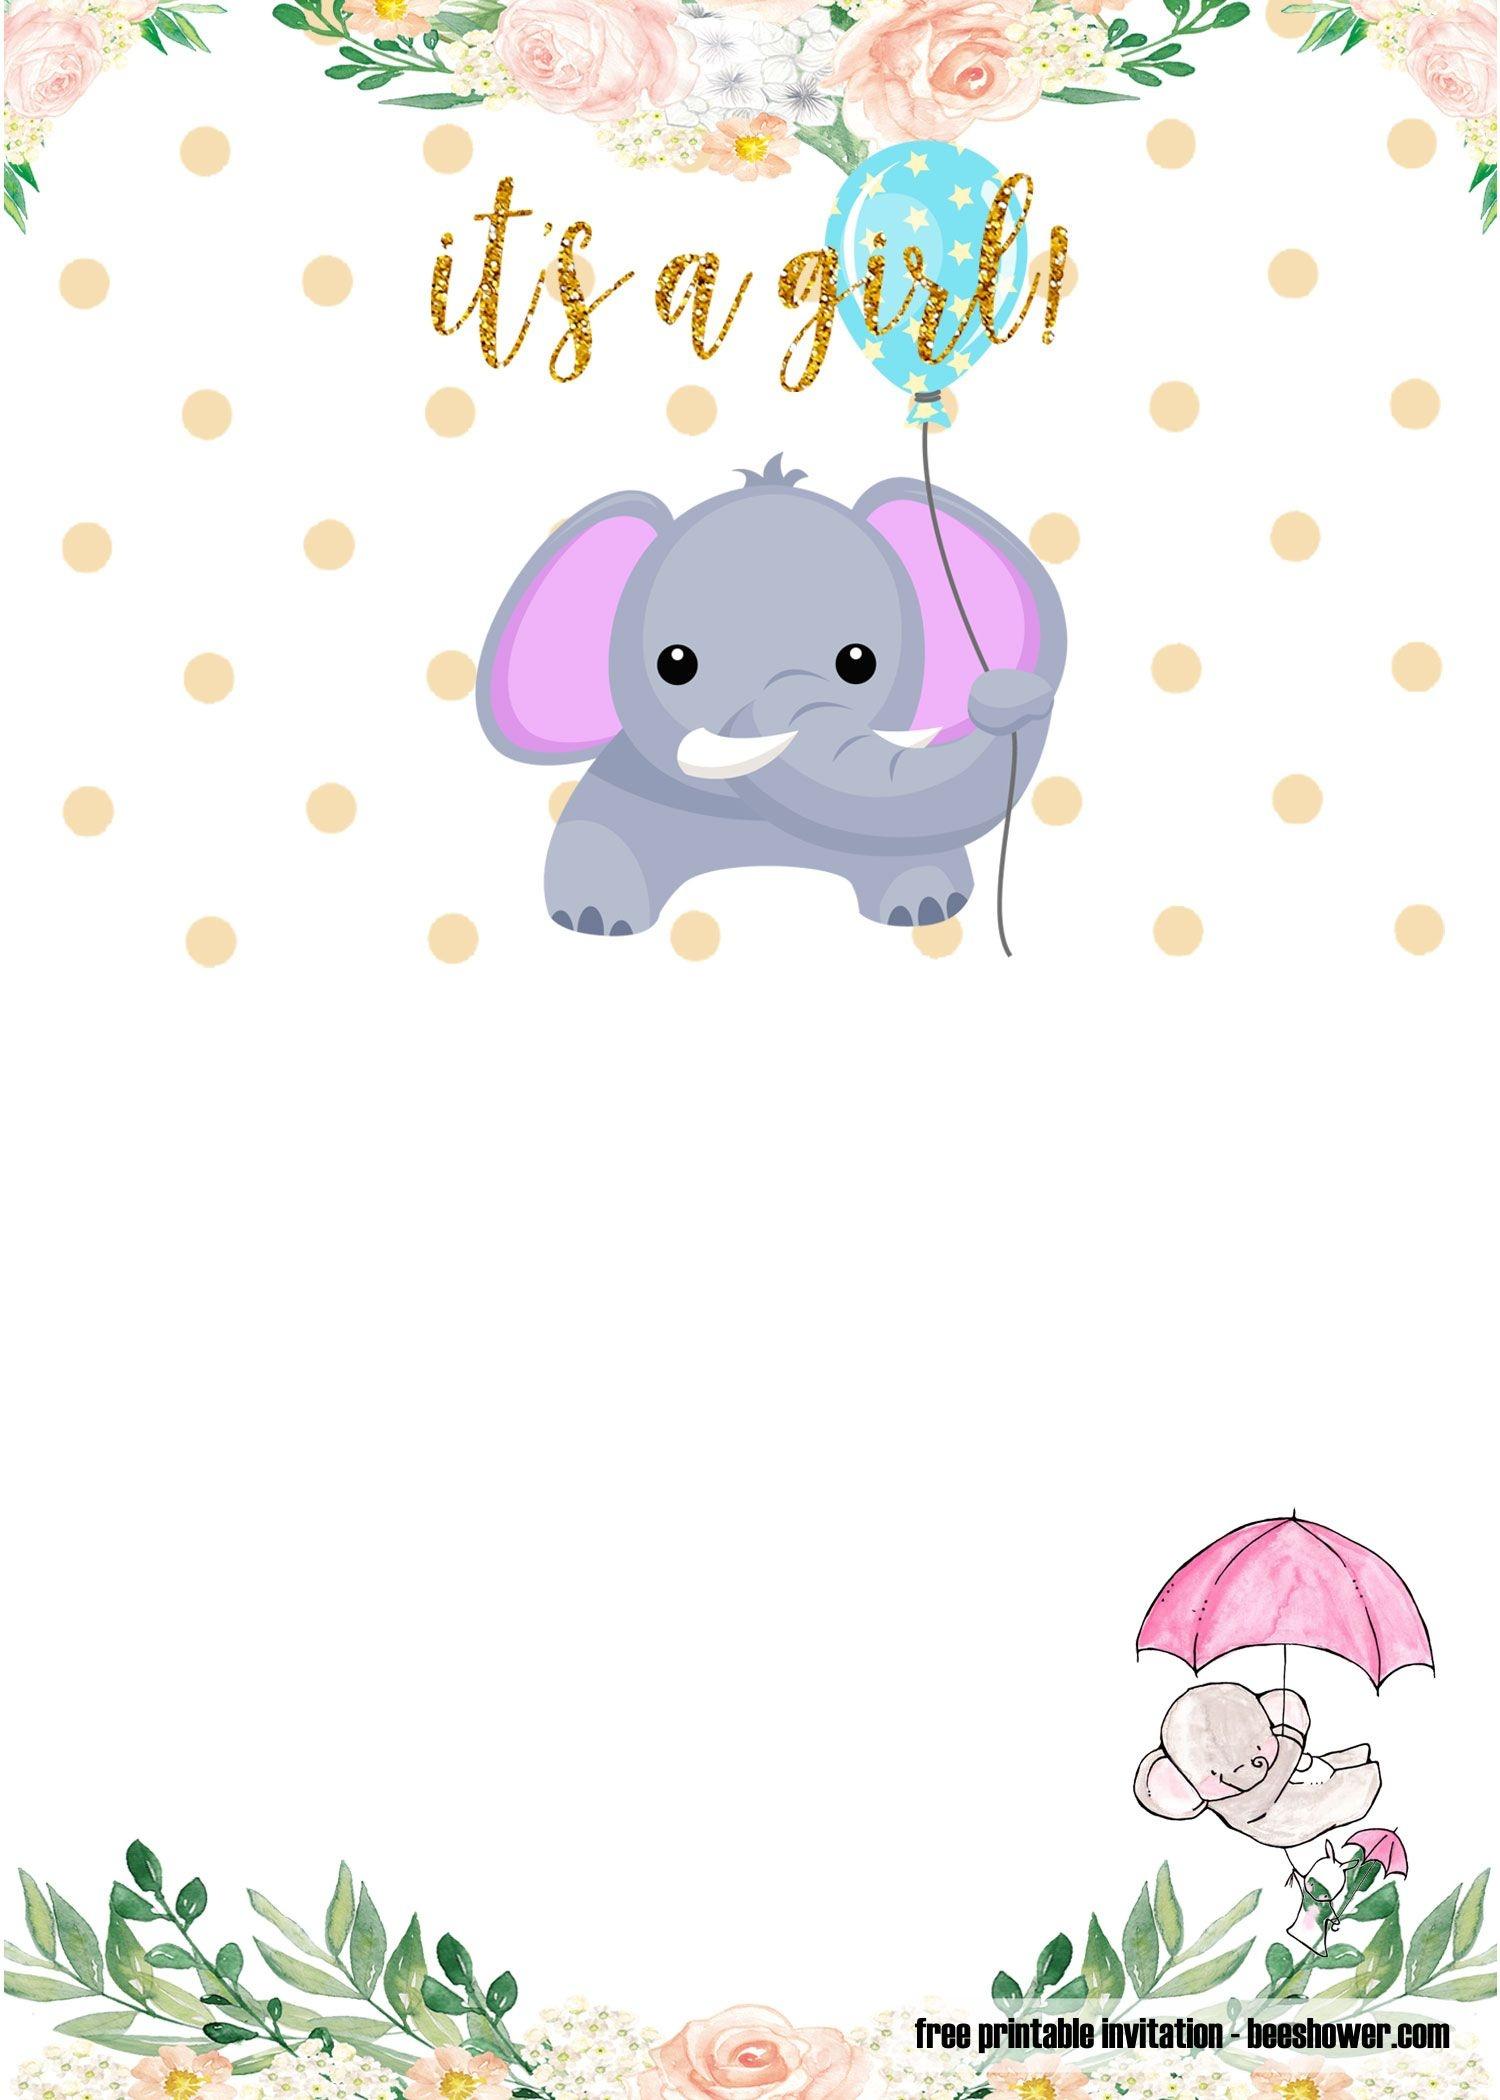 Free Printable Elephant Baby Shower Invitations   Stuff   Baby - Free Printable Elephant Baby Shower Invitations